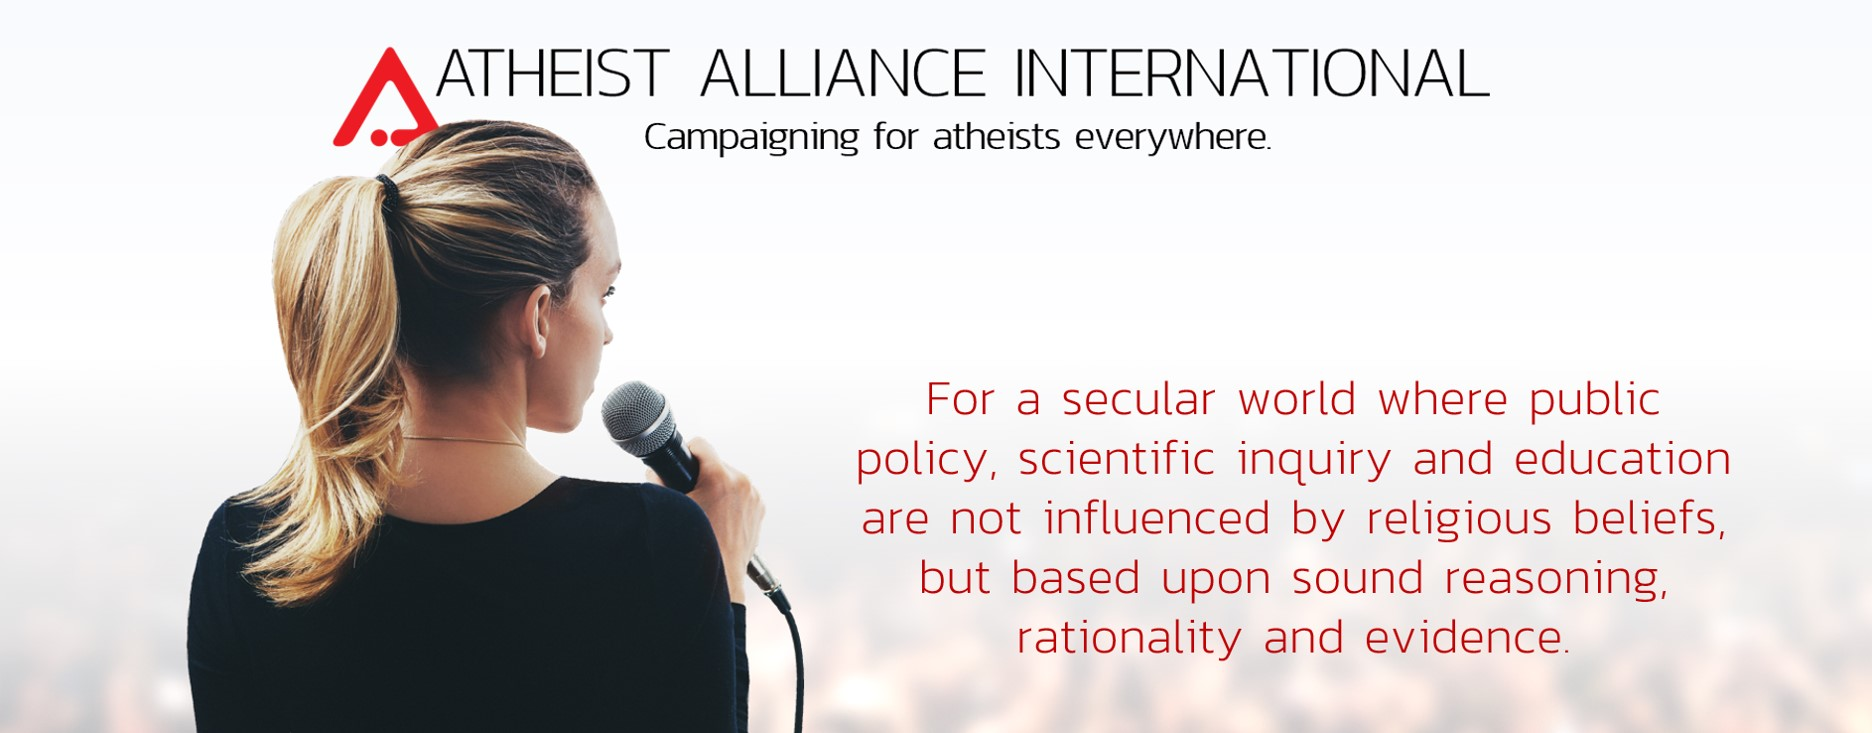 Atheist alliance international a positive voice for atheism and atheist alliance international a positive voice for atheism and secularism biocorpaavc Choice Image